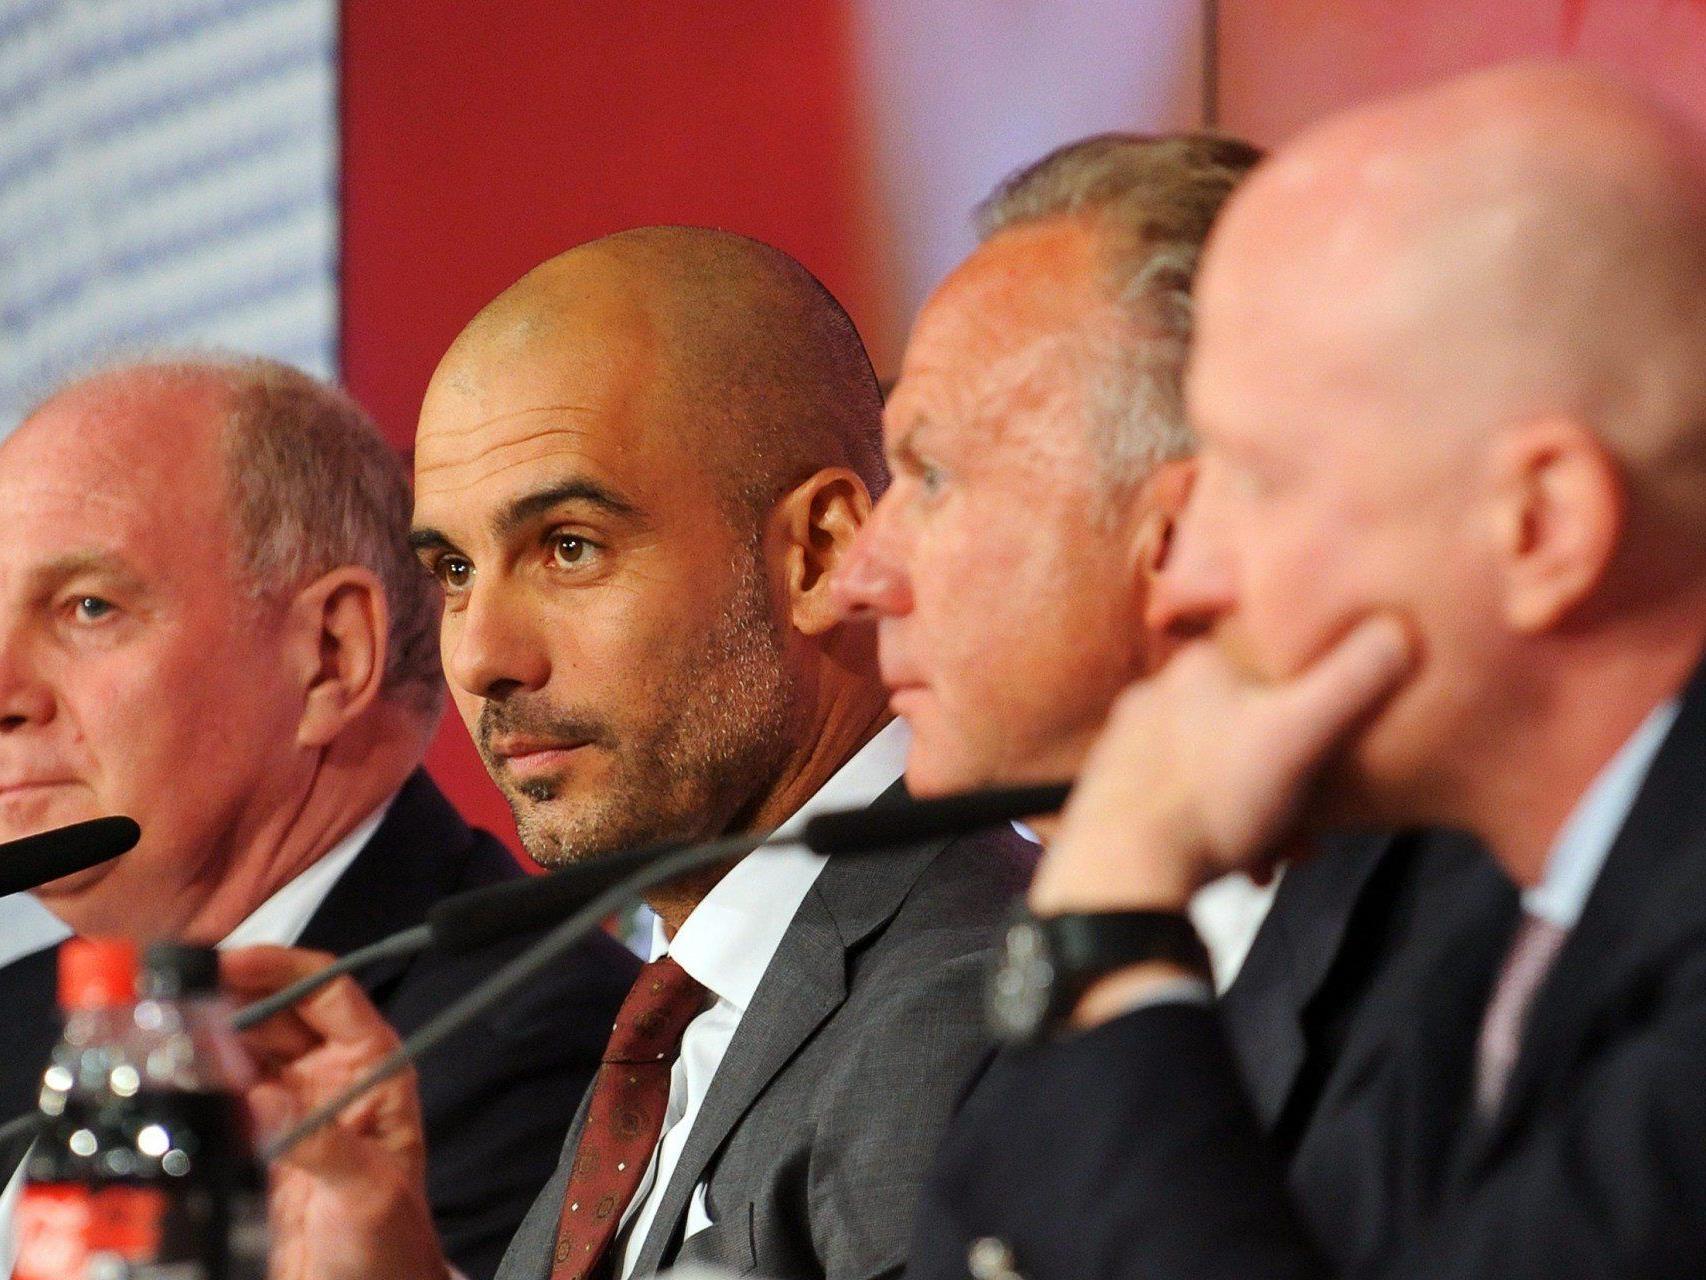 Fußball-Ästhet Guardiola (2.v.l.) tritt seinen Dienst beim FC Bayern an.